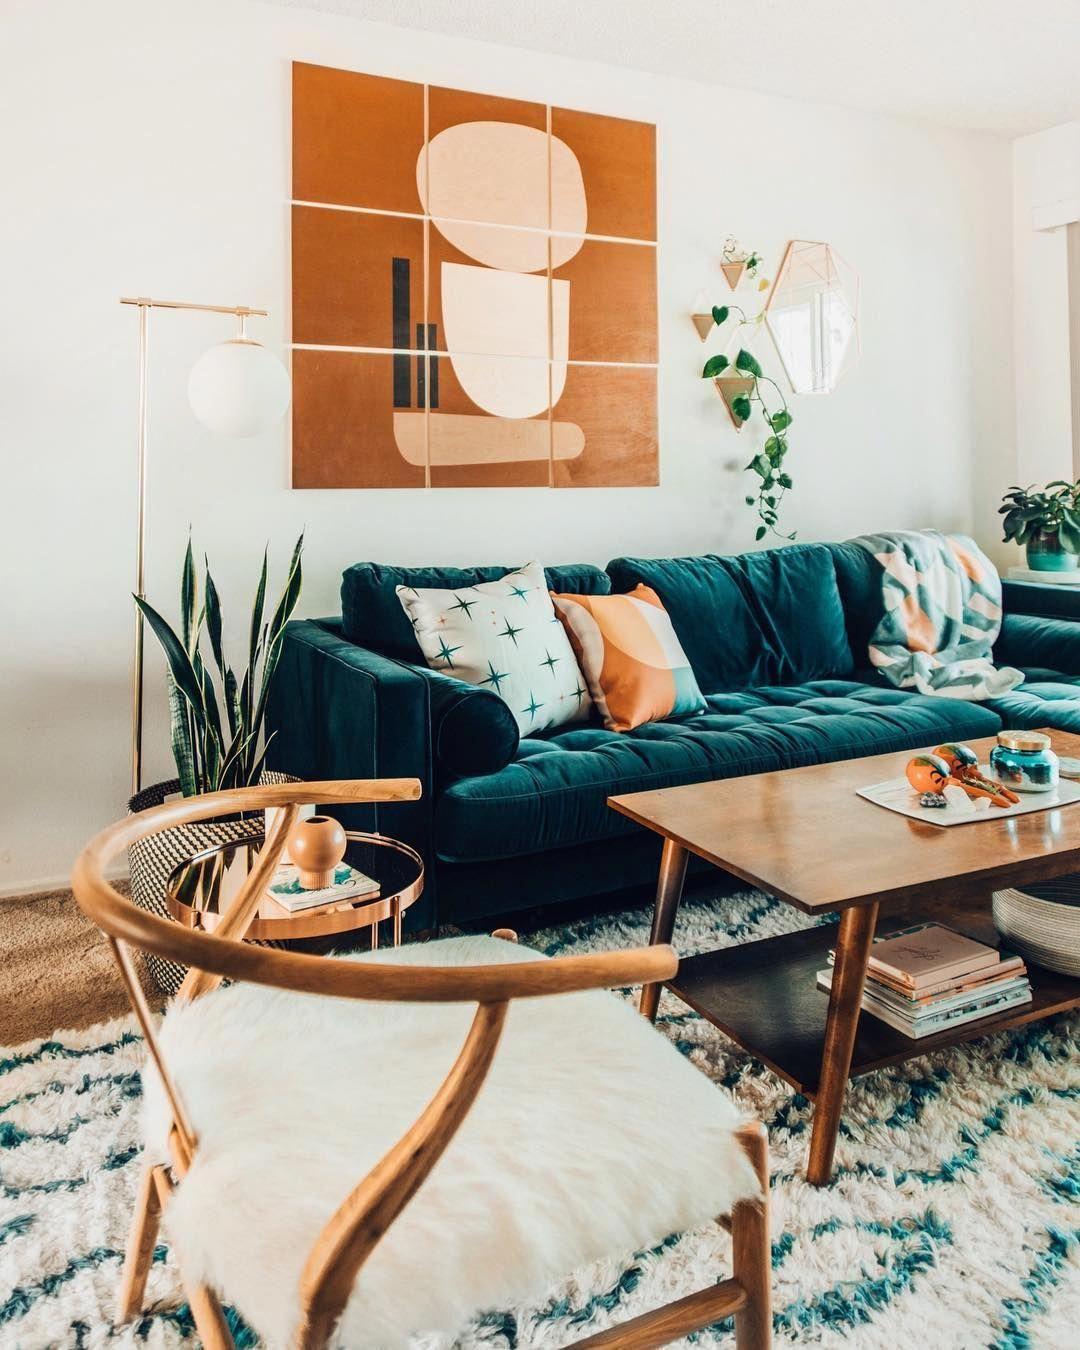 Blue Velvet Sofas With Creative Living Room Decor Ideas Livingroomfurniturechairs Teal Sofa Living Room Velvet Sofa Living Room Teal Couch Living Room